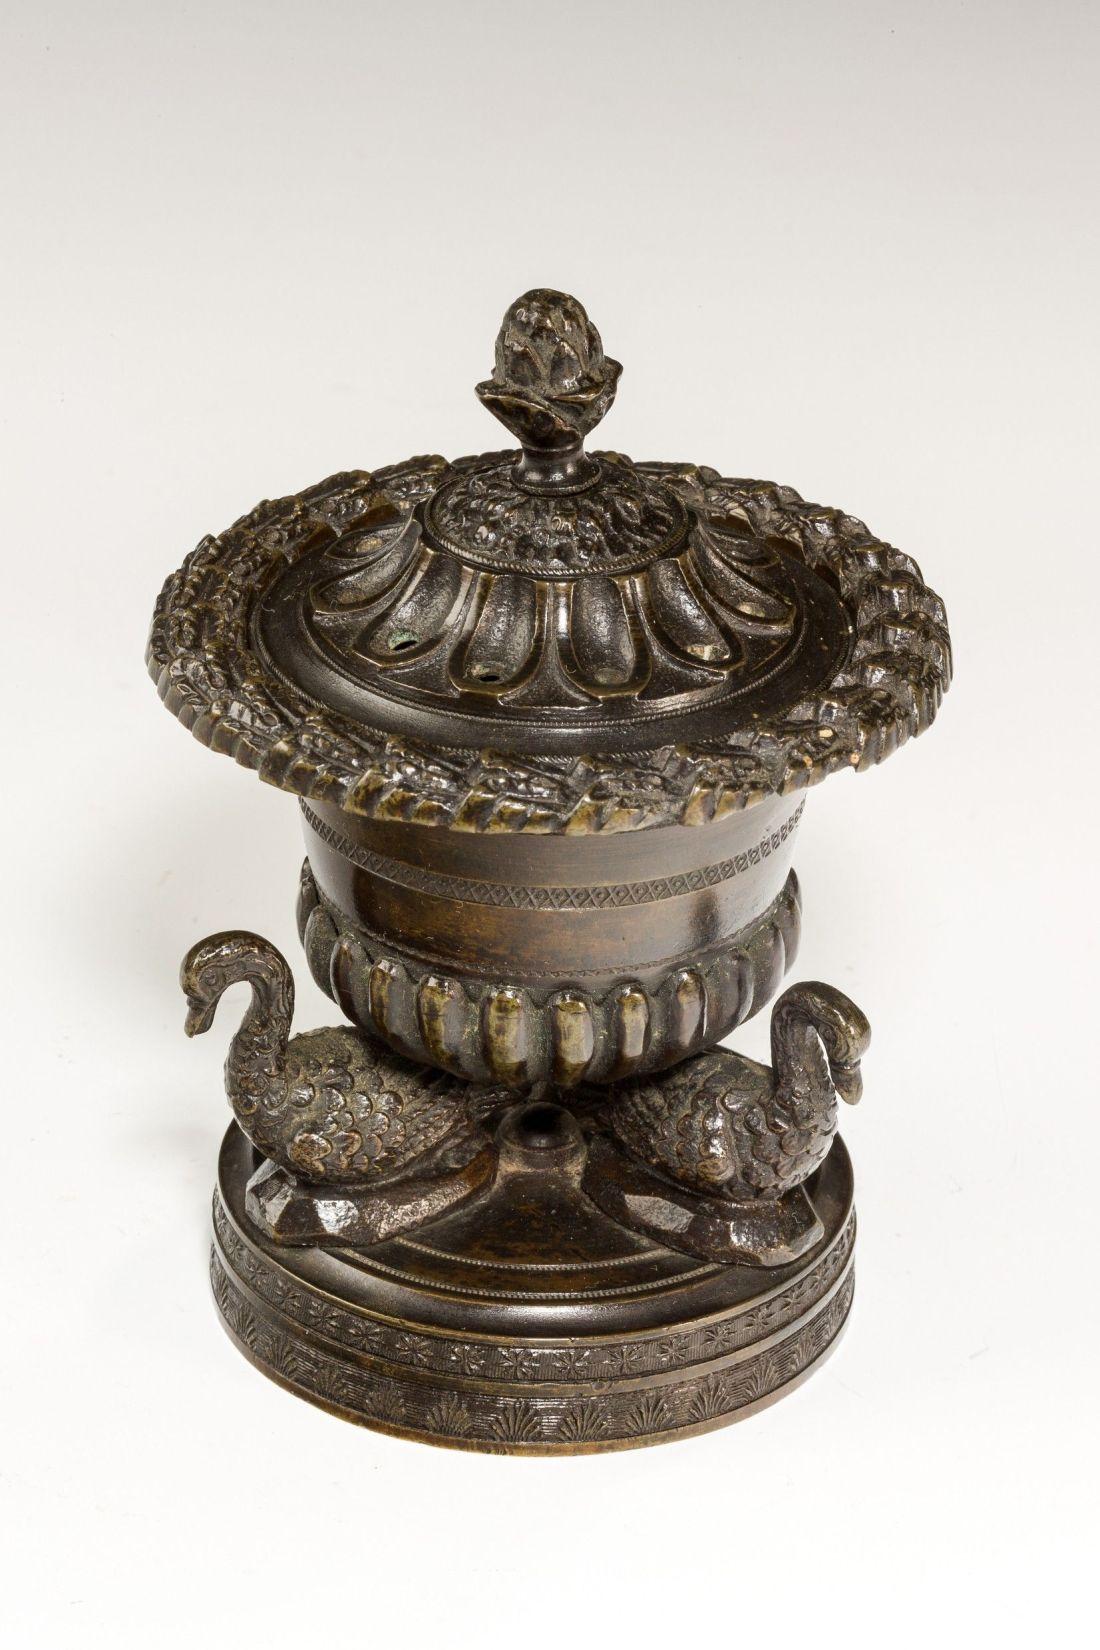 bronze-pastille-burner-three-swans-Regency-antique-5312_2_5312